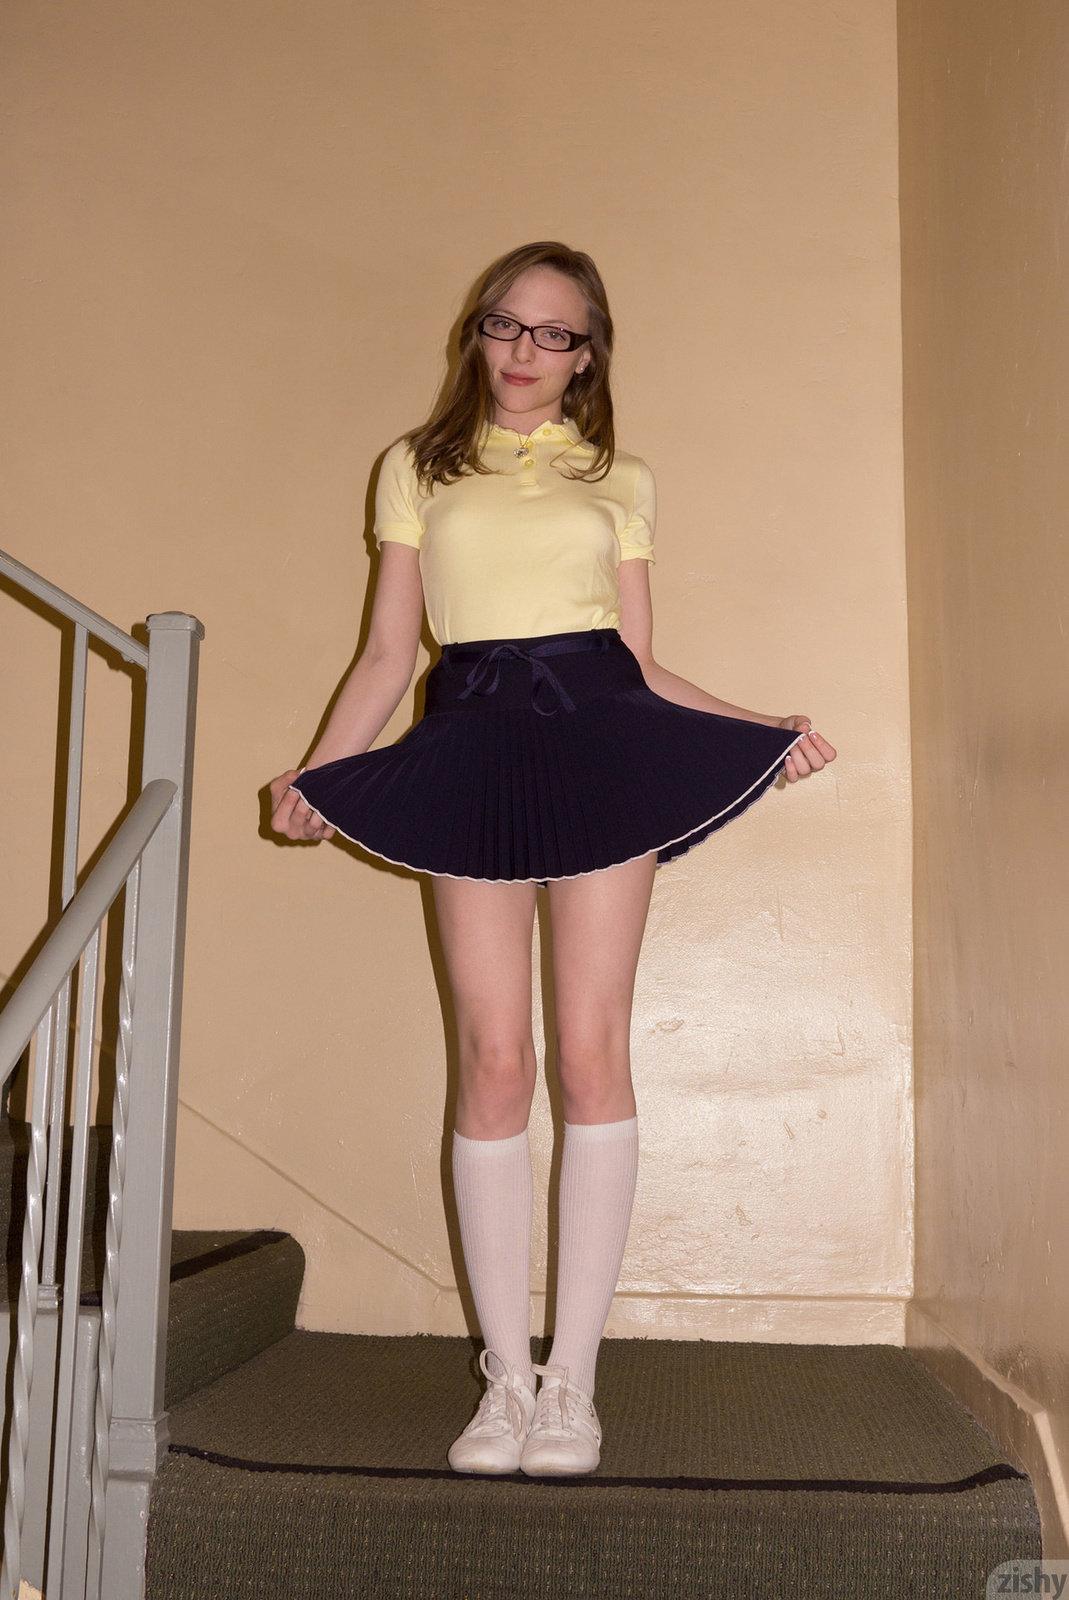 Aubrey Star In Privates School By Zishy 12 Photos -9384